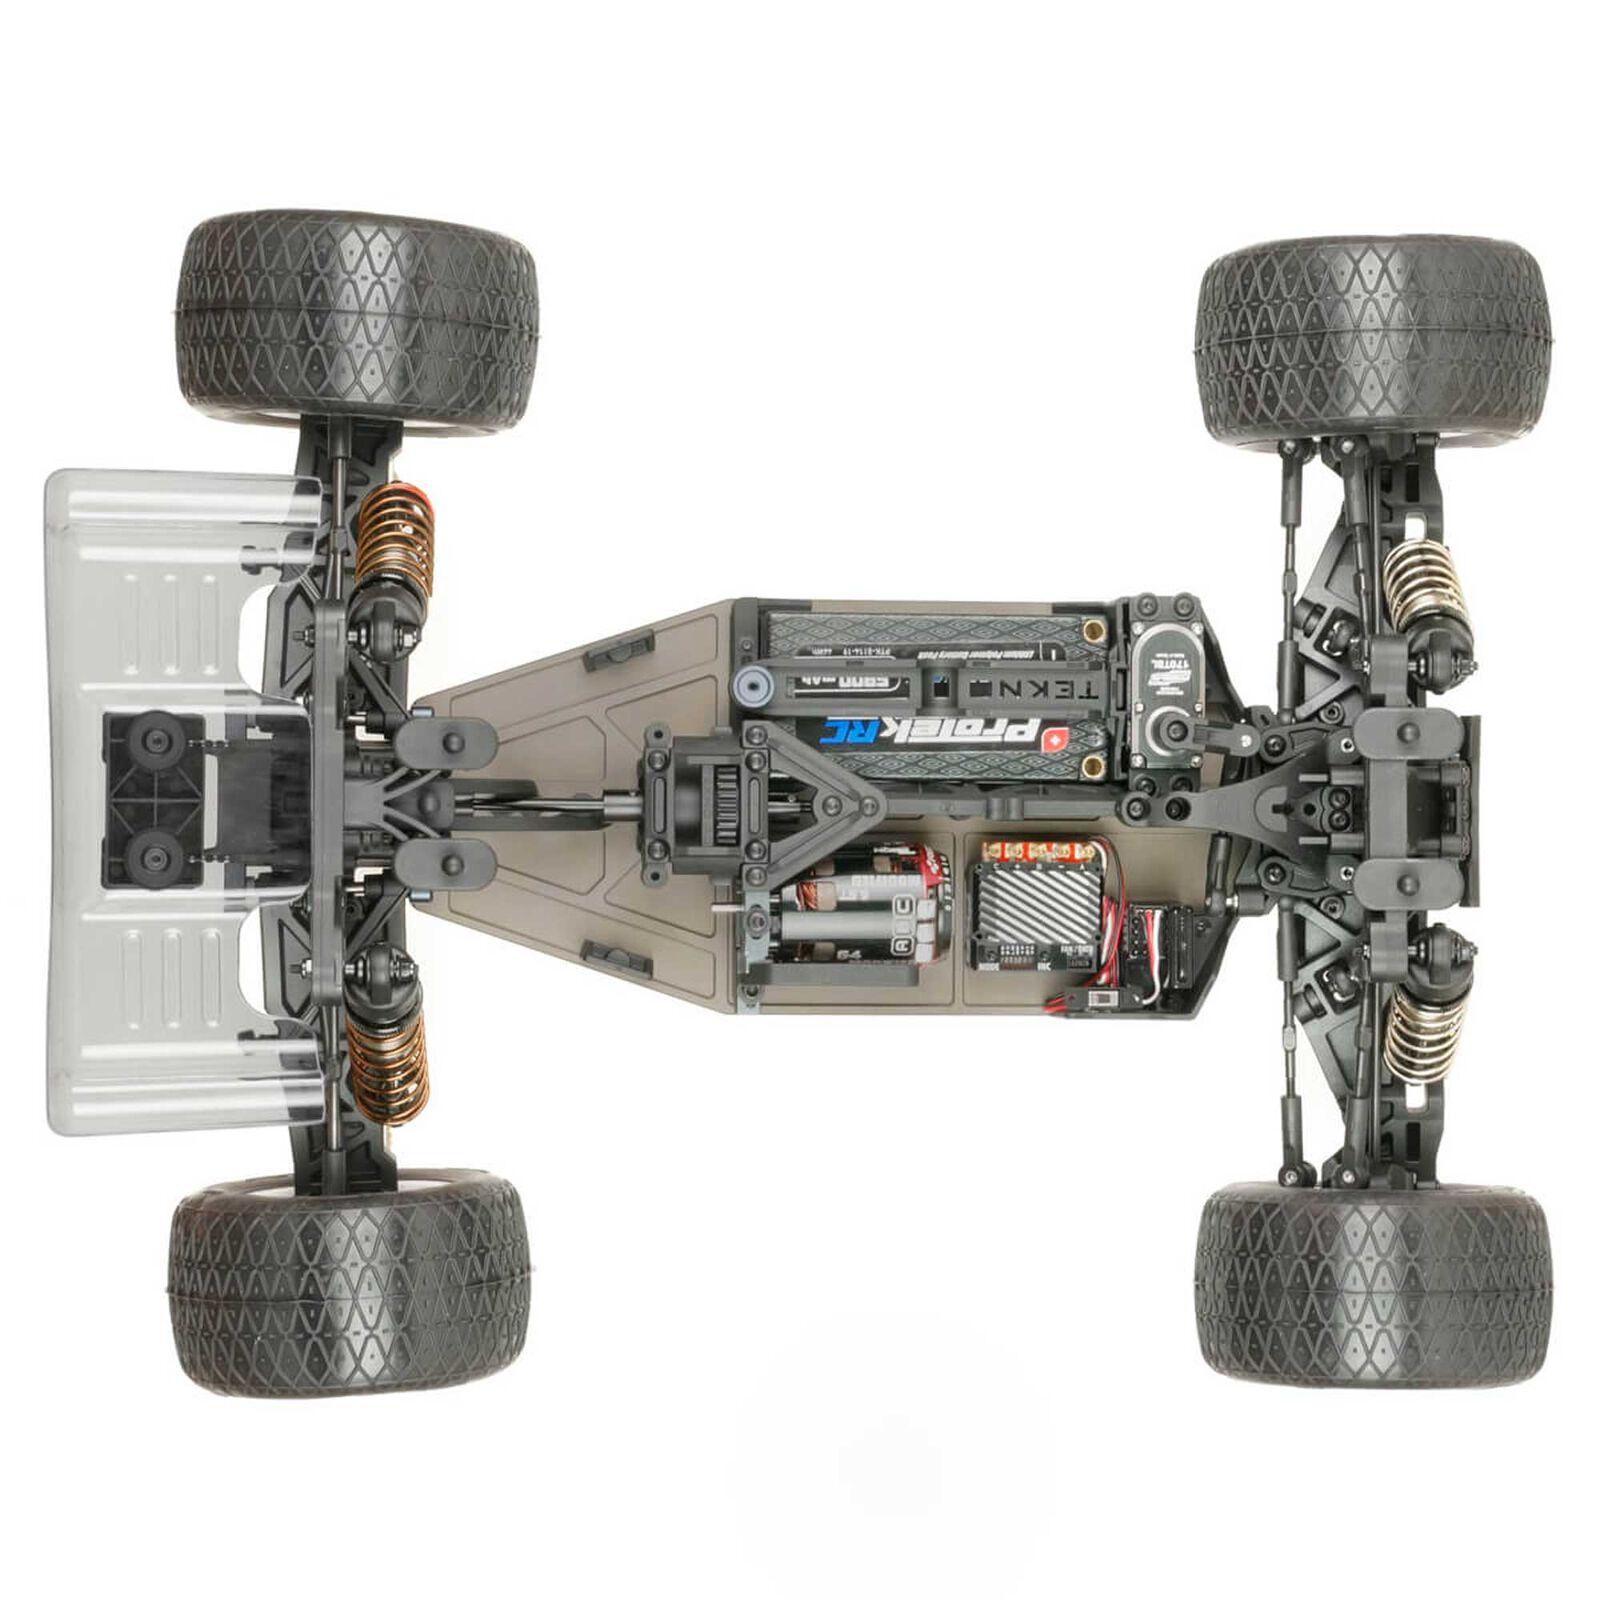 Sumo Racing Tekno EB410.2 ET410.2 EB410 ET410 Skid Plate Frt//Rear Combo